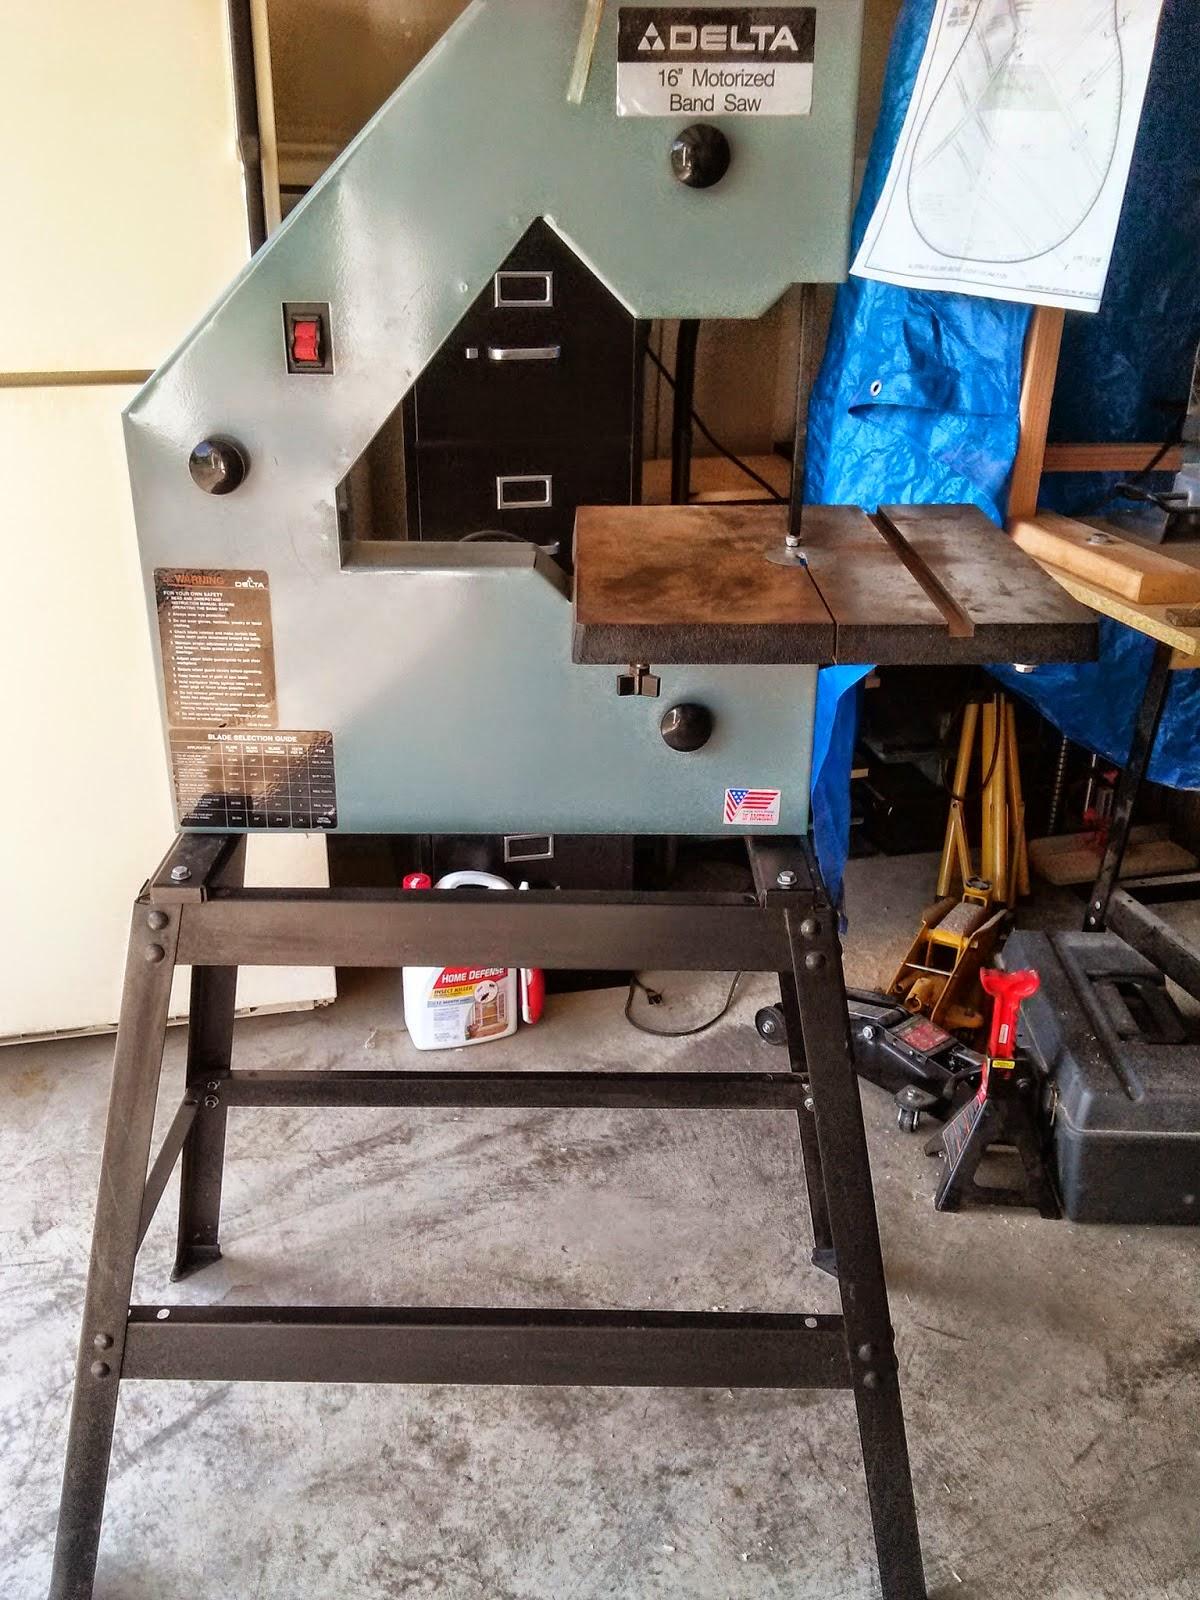 Manual craftsman router table ebook mini hobby table saw array molnar opus 1 harpsichord project november 2014 rh molnaropus1 blogspot com fandeluxe Gallery